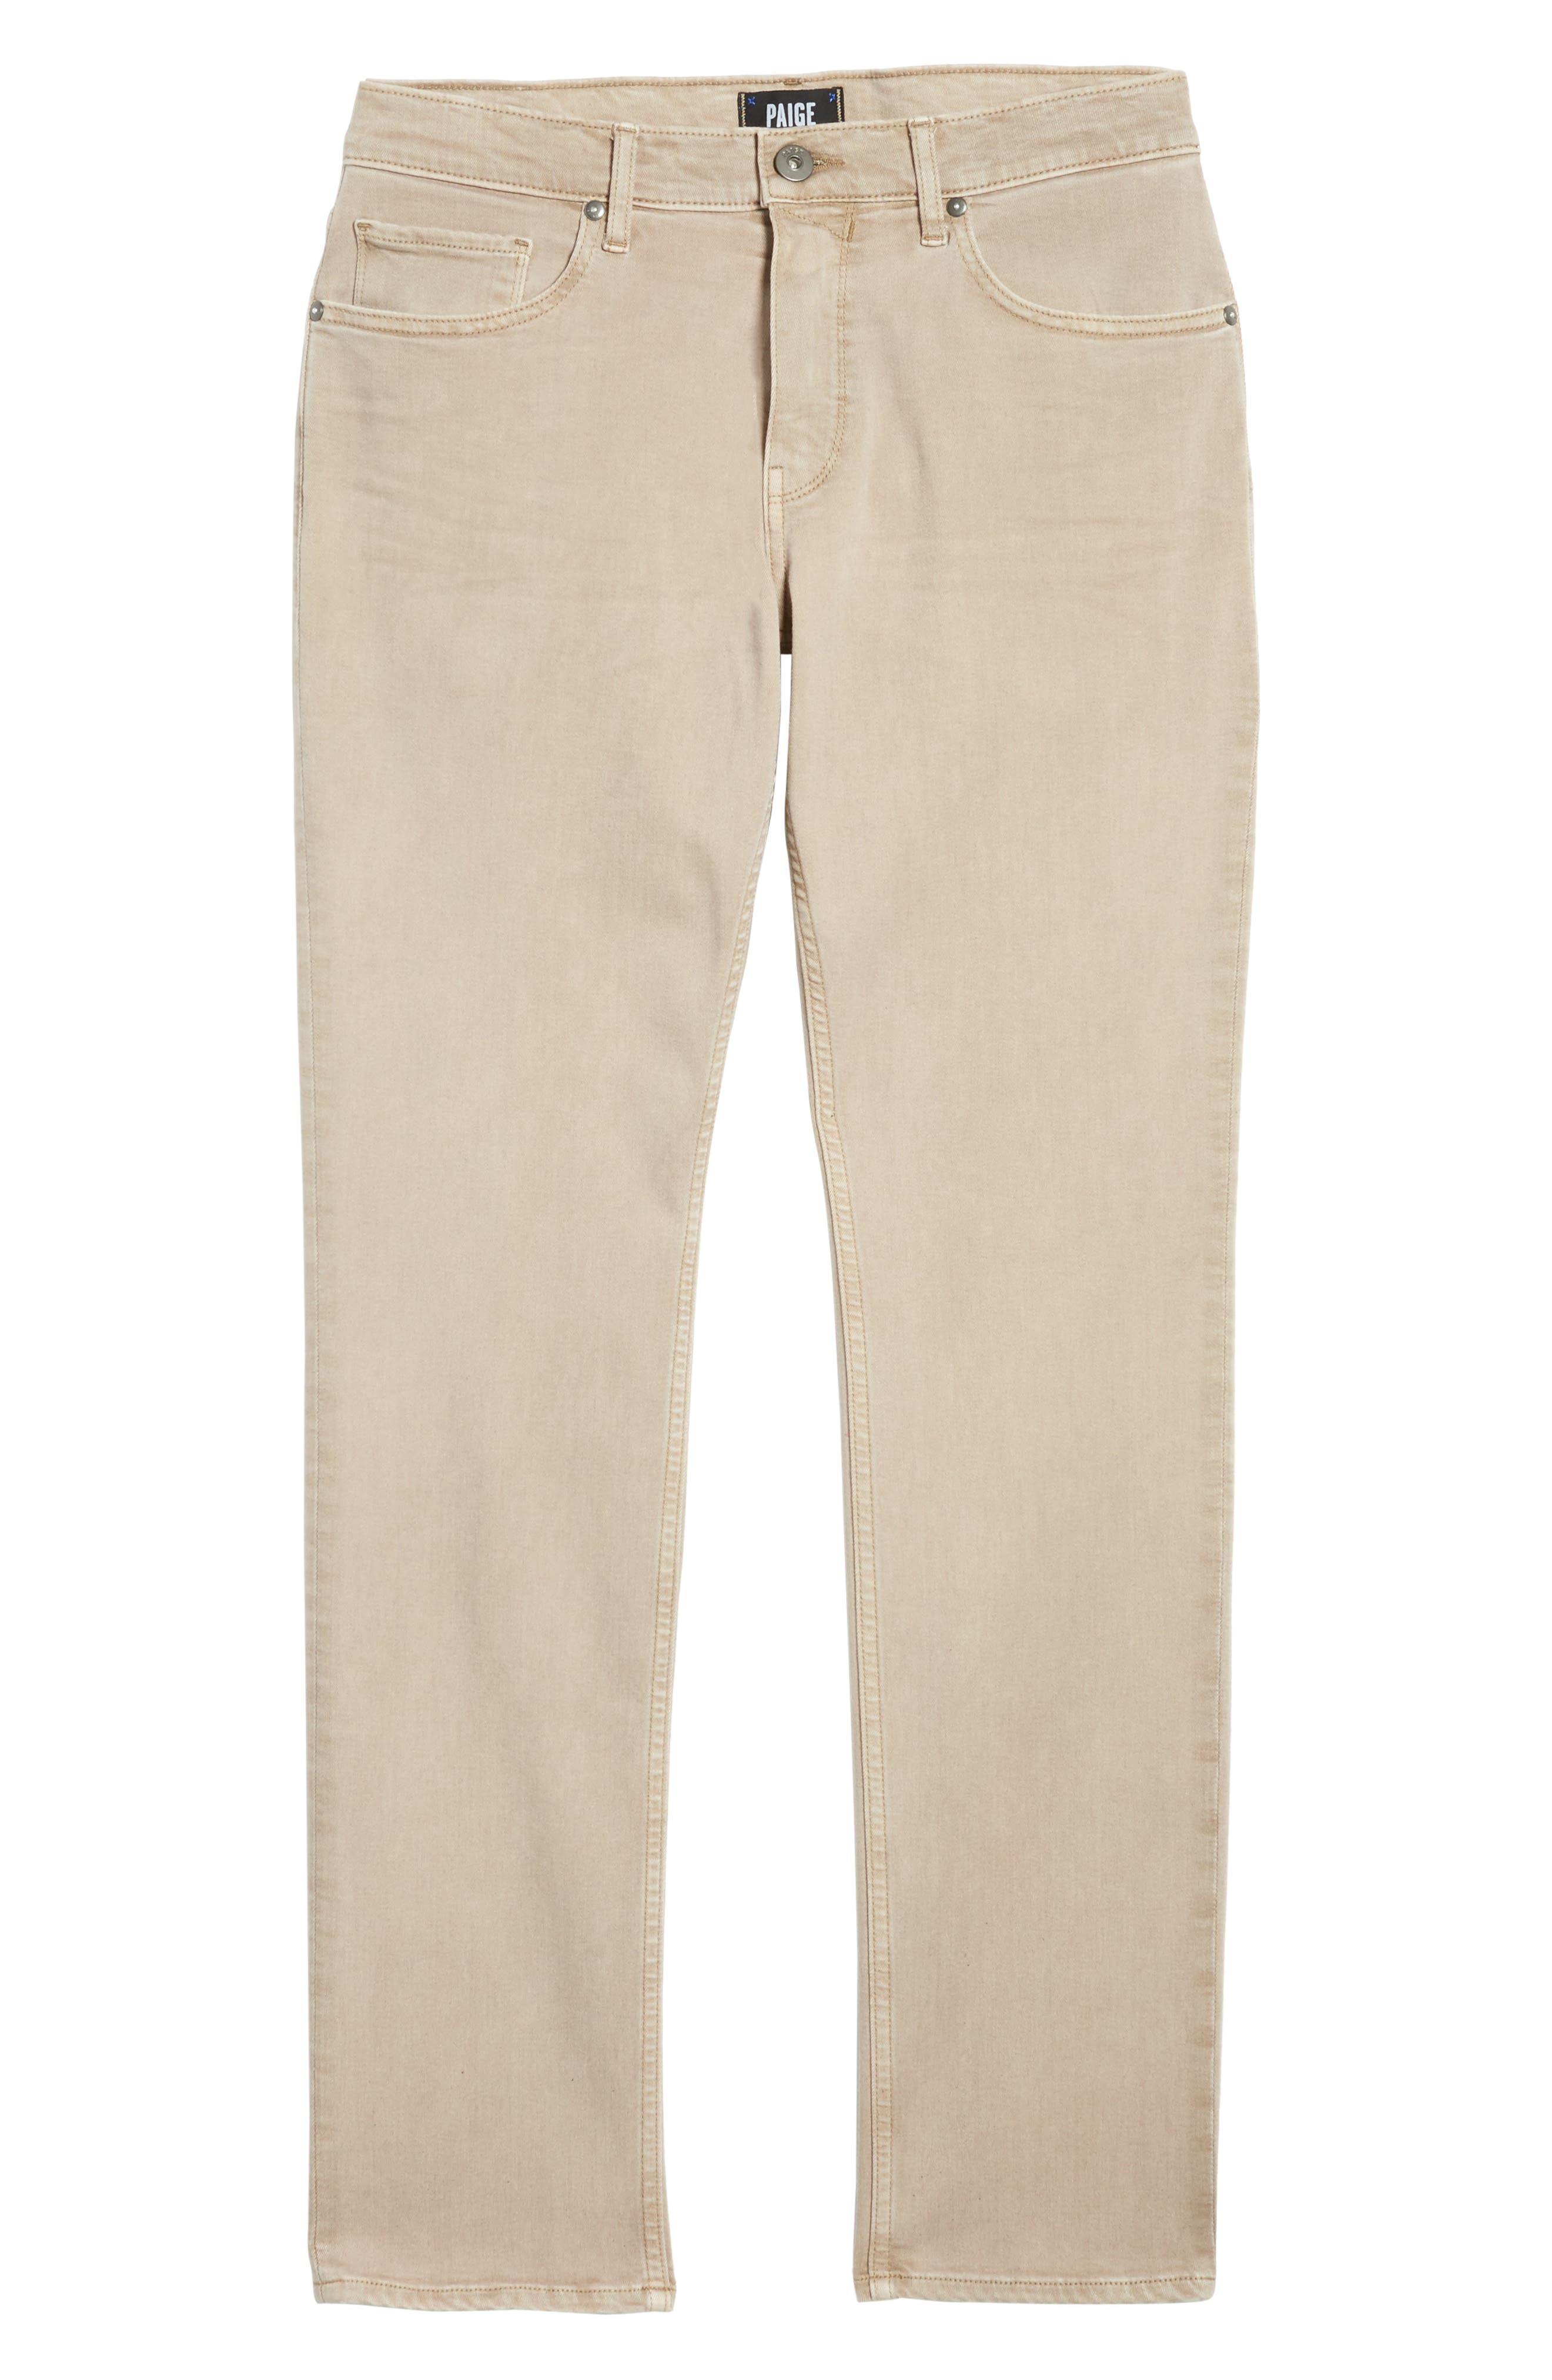 Federal Slim Straight Leg Jeans,                             Alternate thumbnail 6, color,                             Vintage Dune